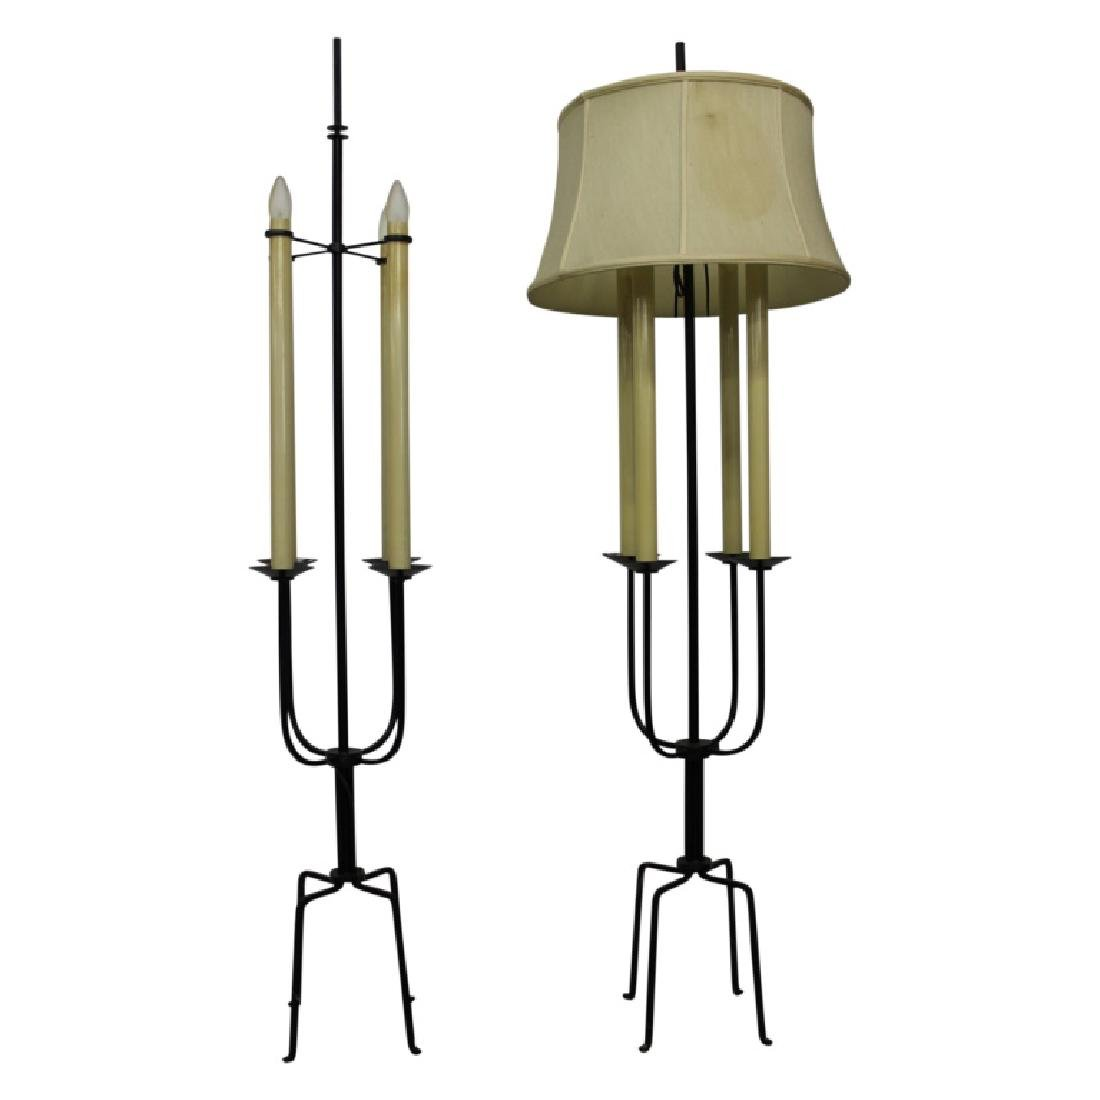 Pair of Tommi Parzinger Floor Lamps - 2